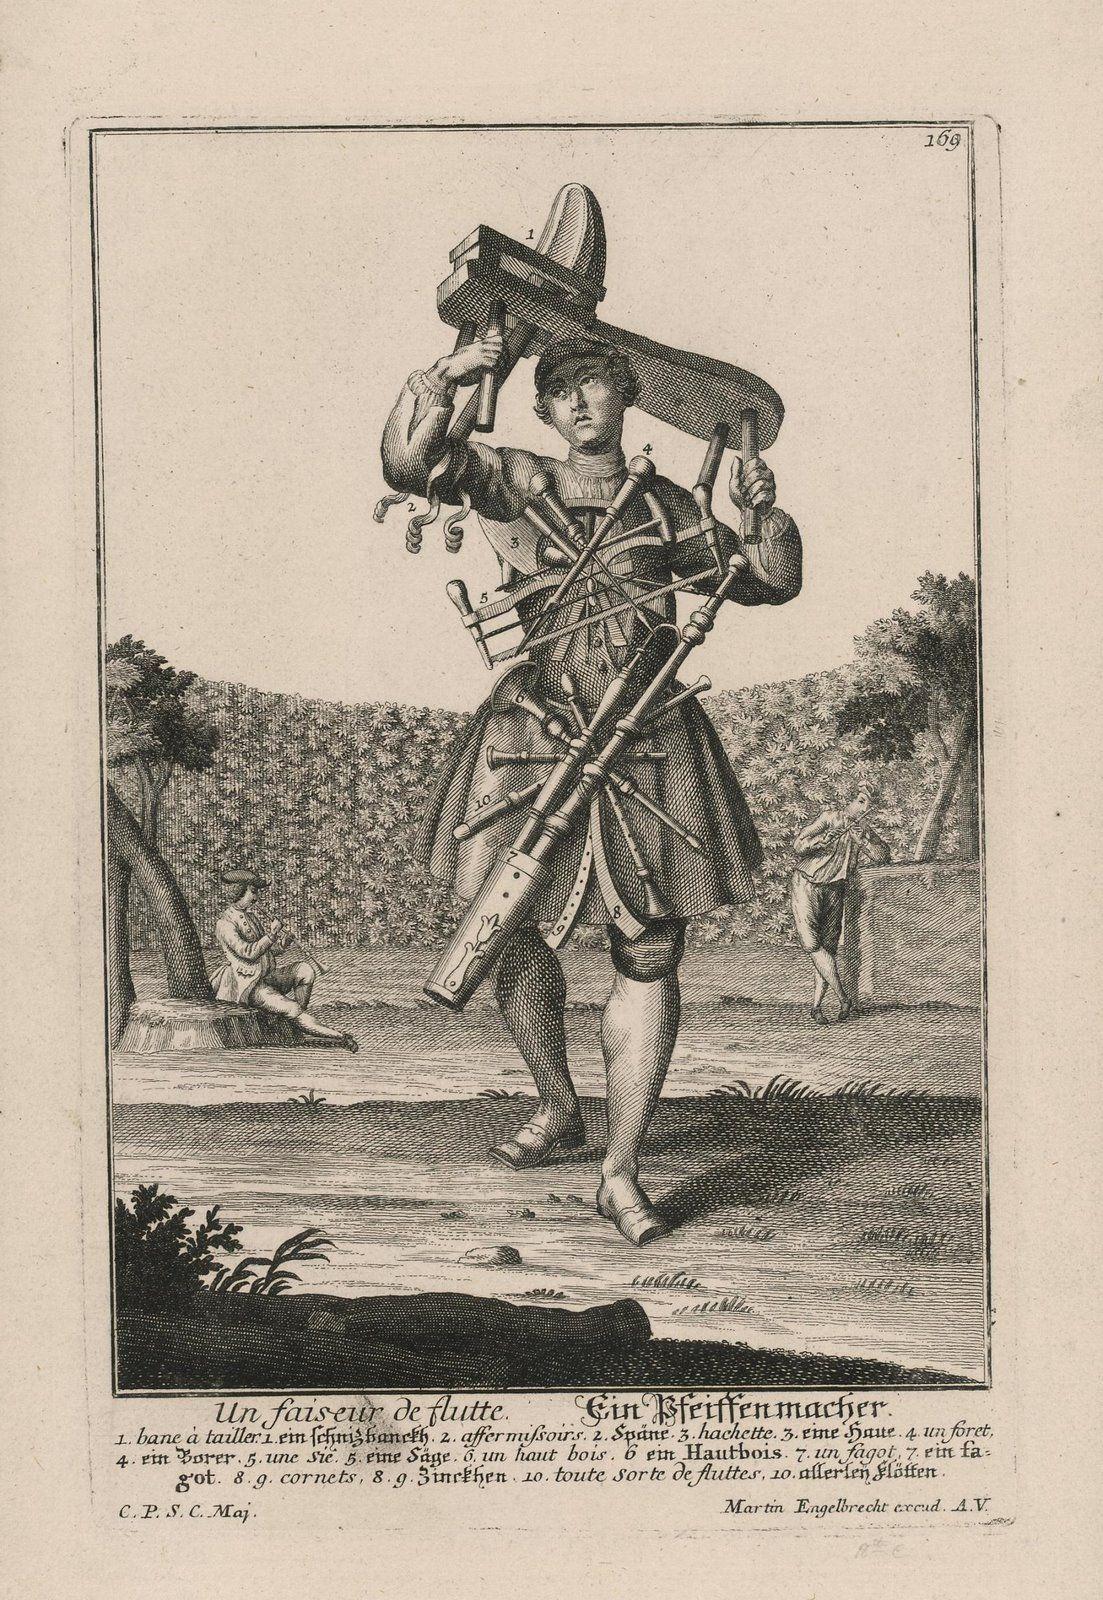 [Michael+Rössler+Un+faiseur+de+flutte+(A+Male+Wind+Instrument+Maker),+mid-18th+century.jpg]